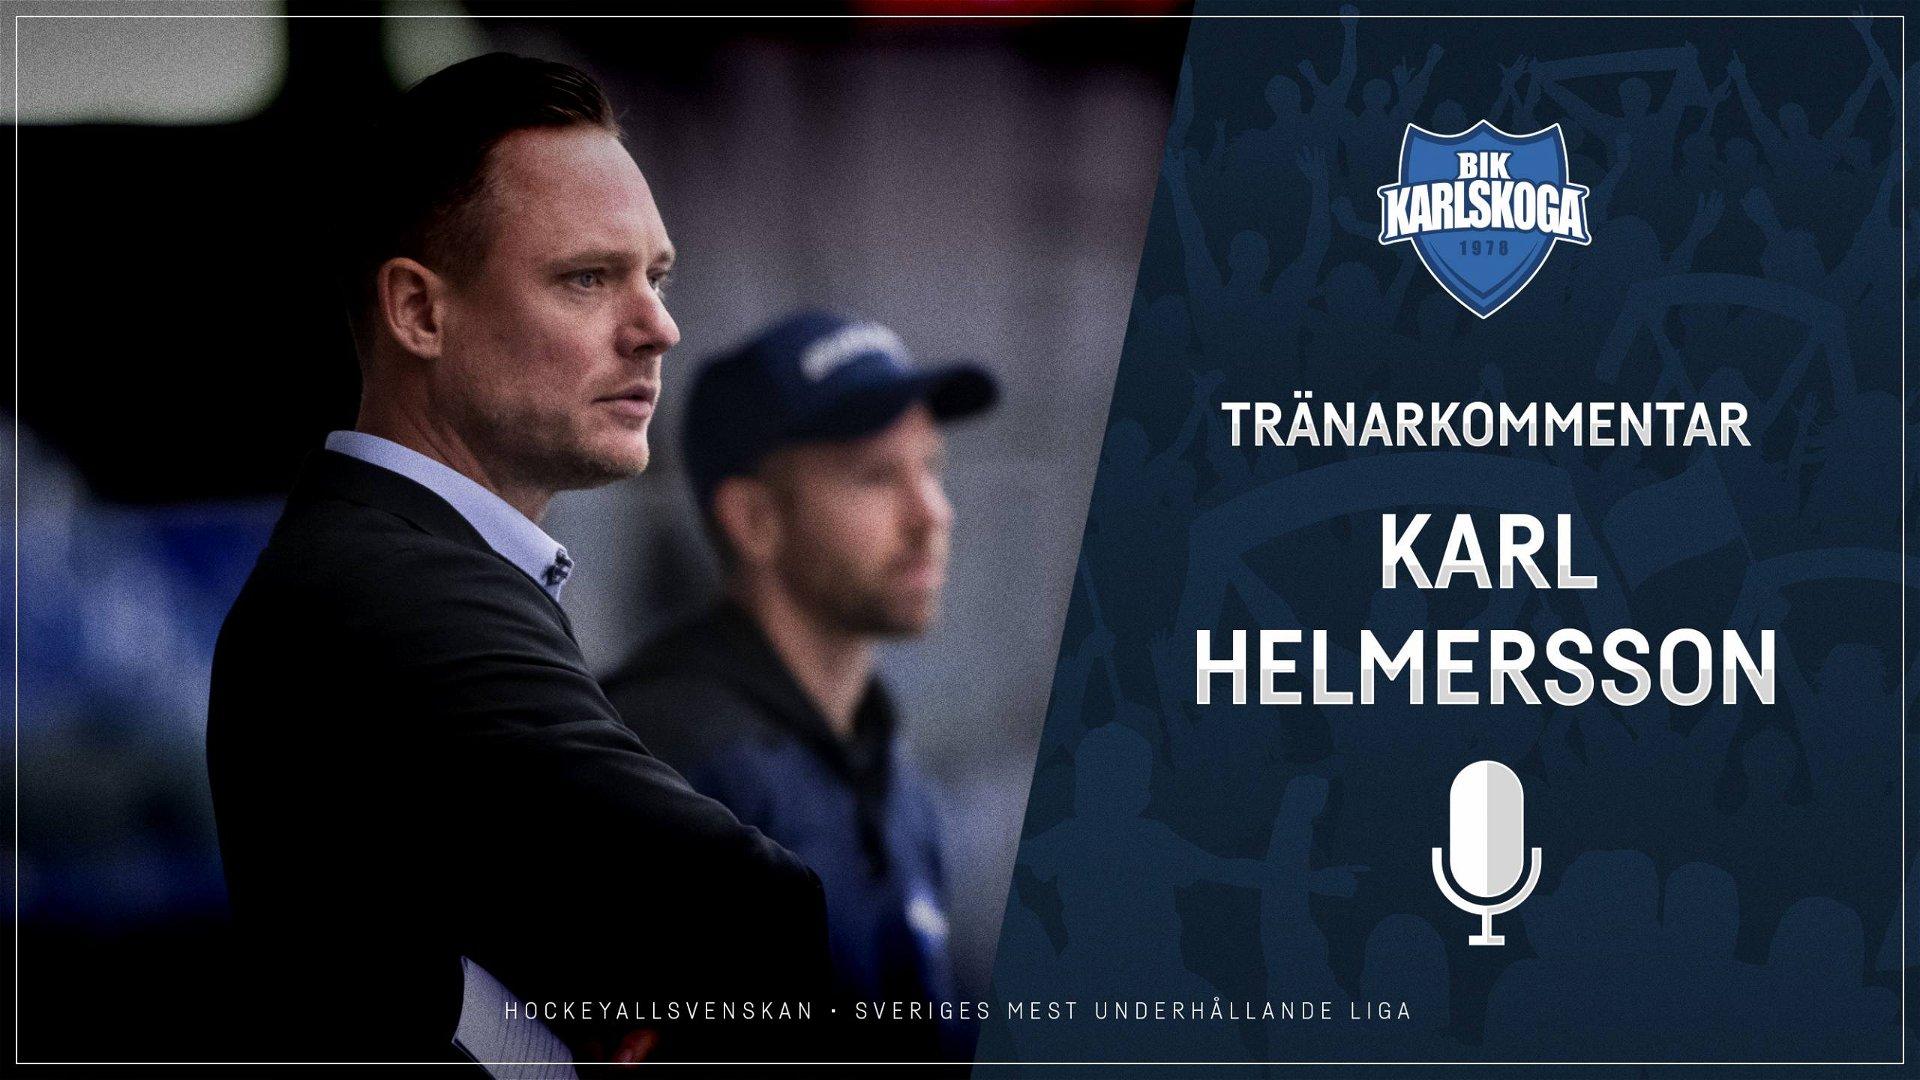 2020-11-11 Segerintervju: Karl Helmersson